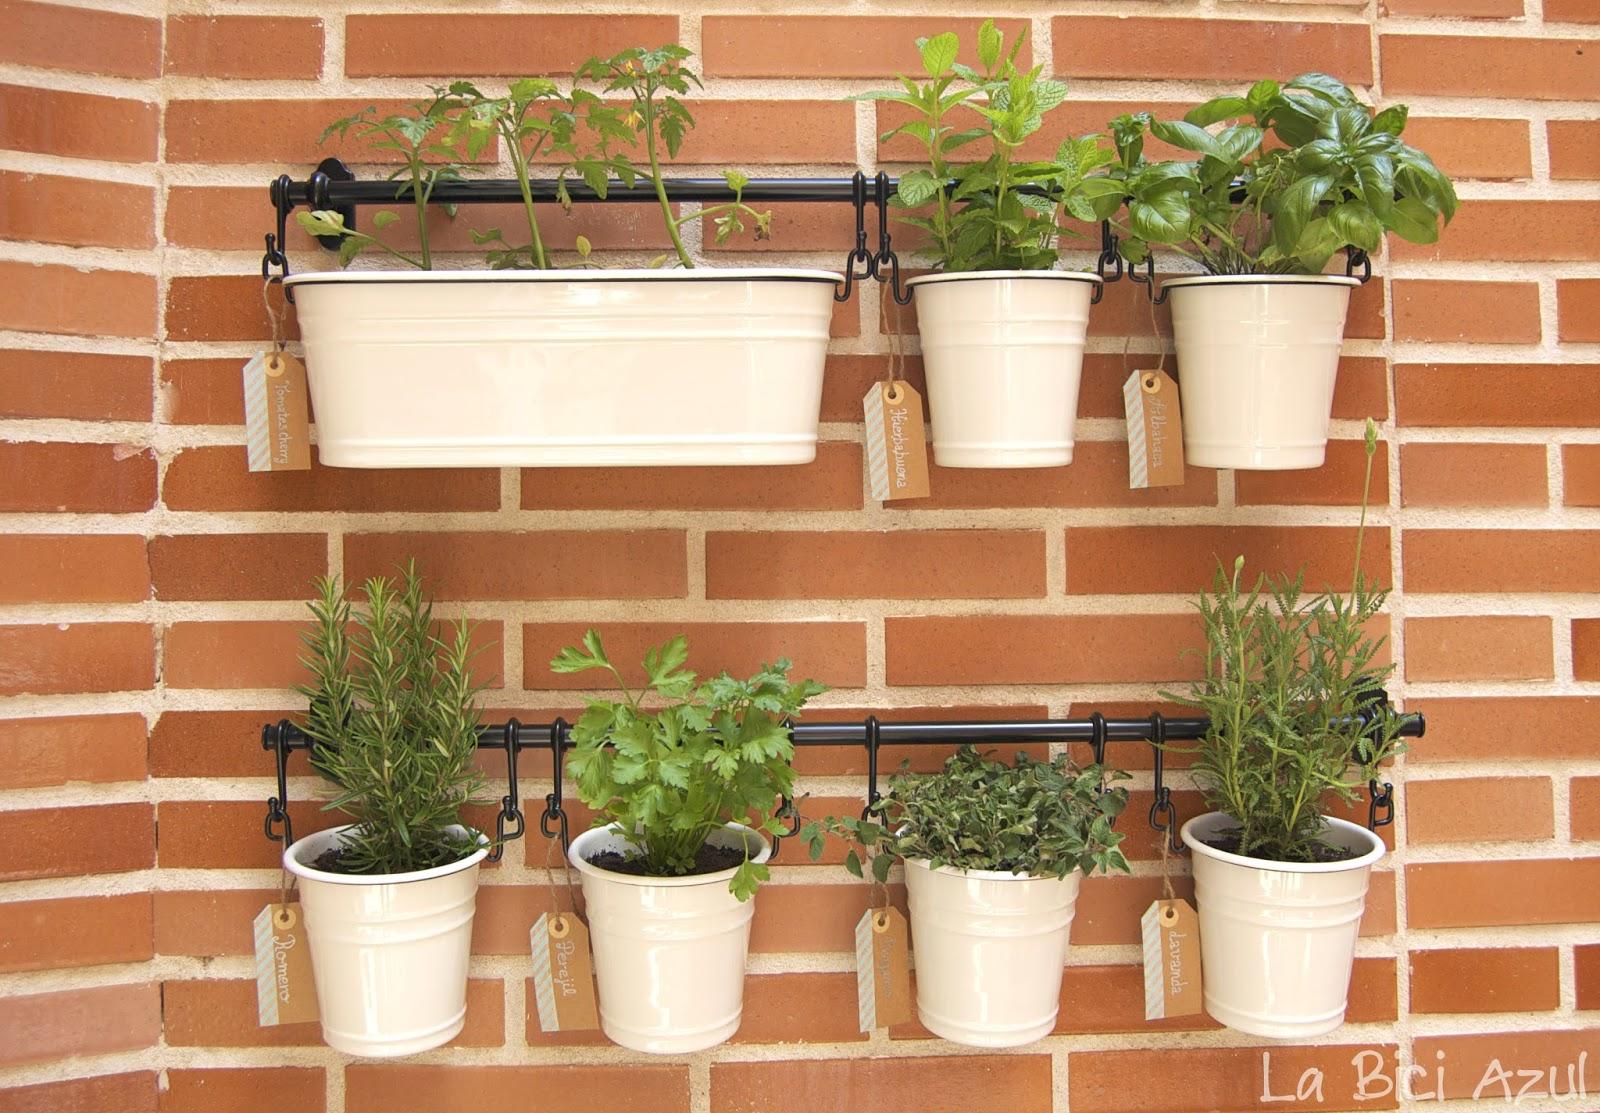 Macetas huerto urbano ikea vertical mueblesueco - Ikea macetas exterior ...